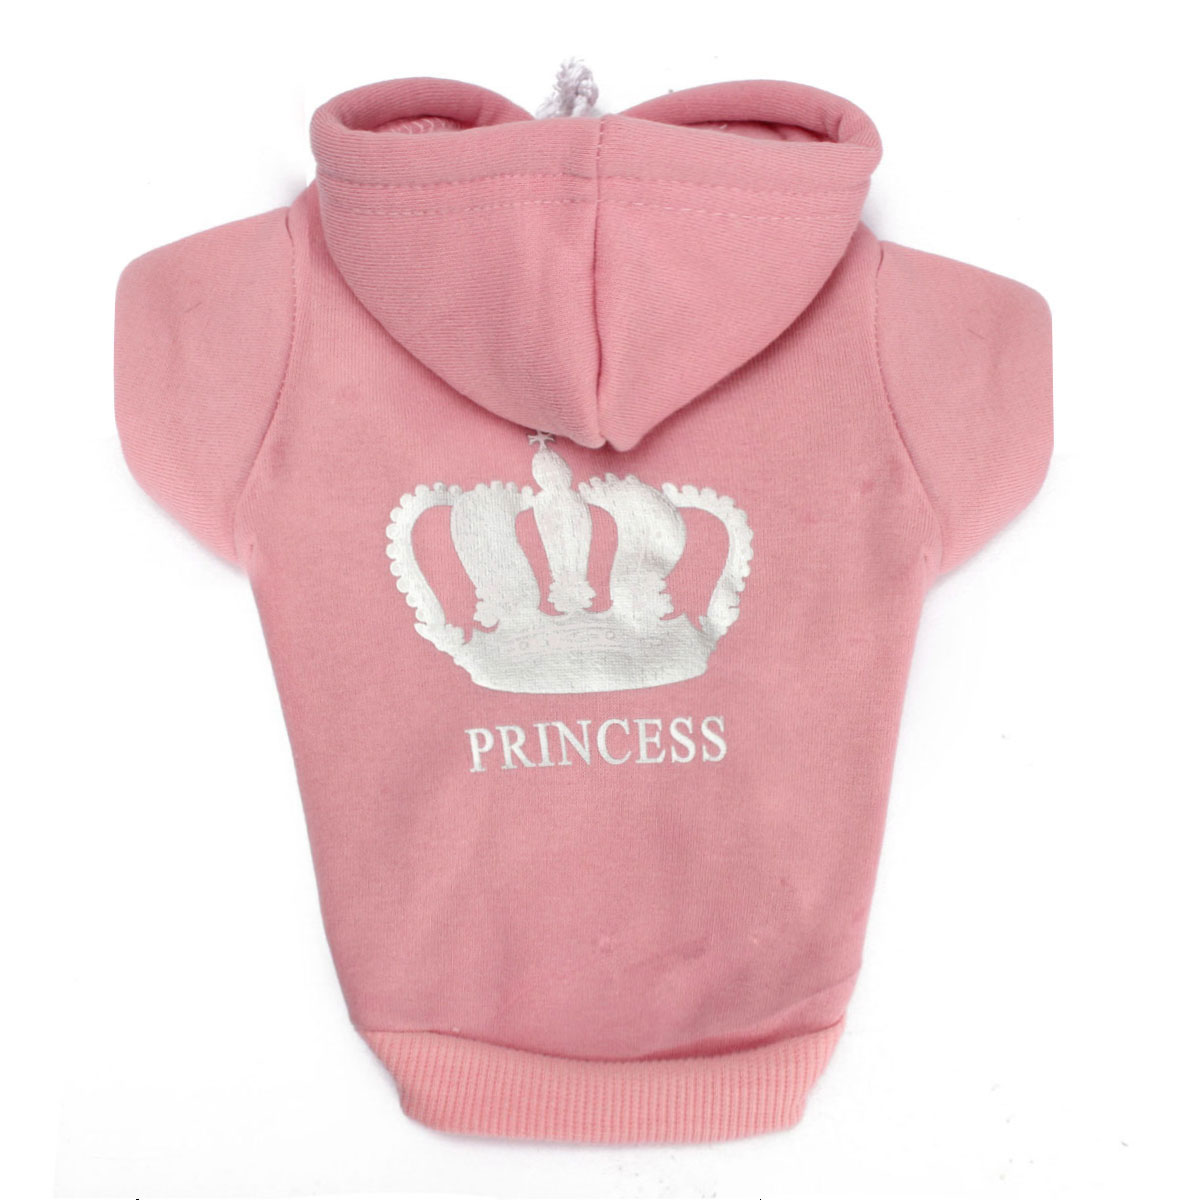 Small hoodie